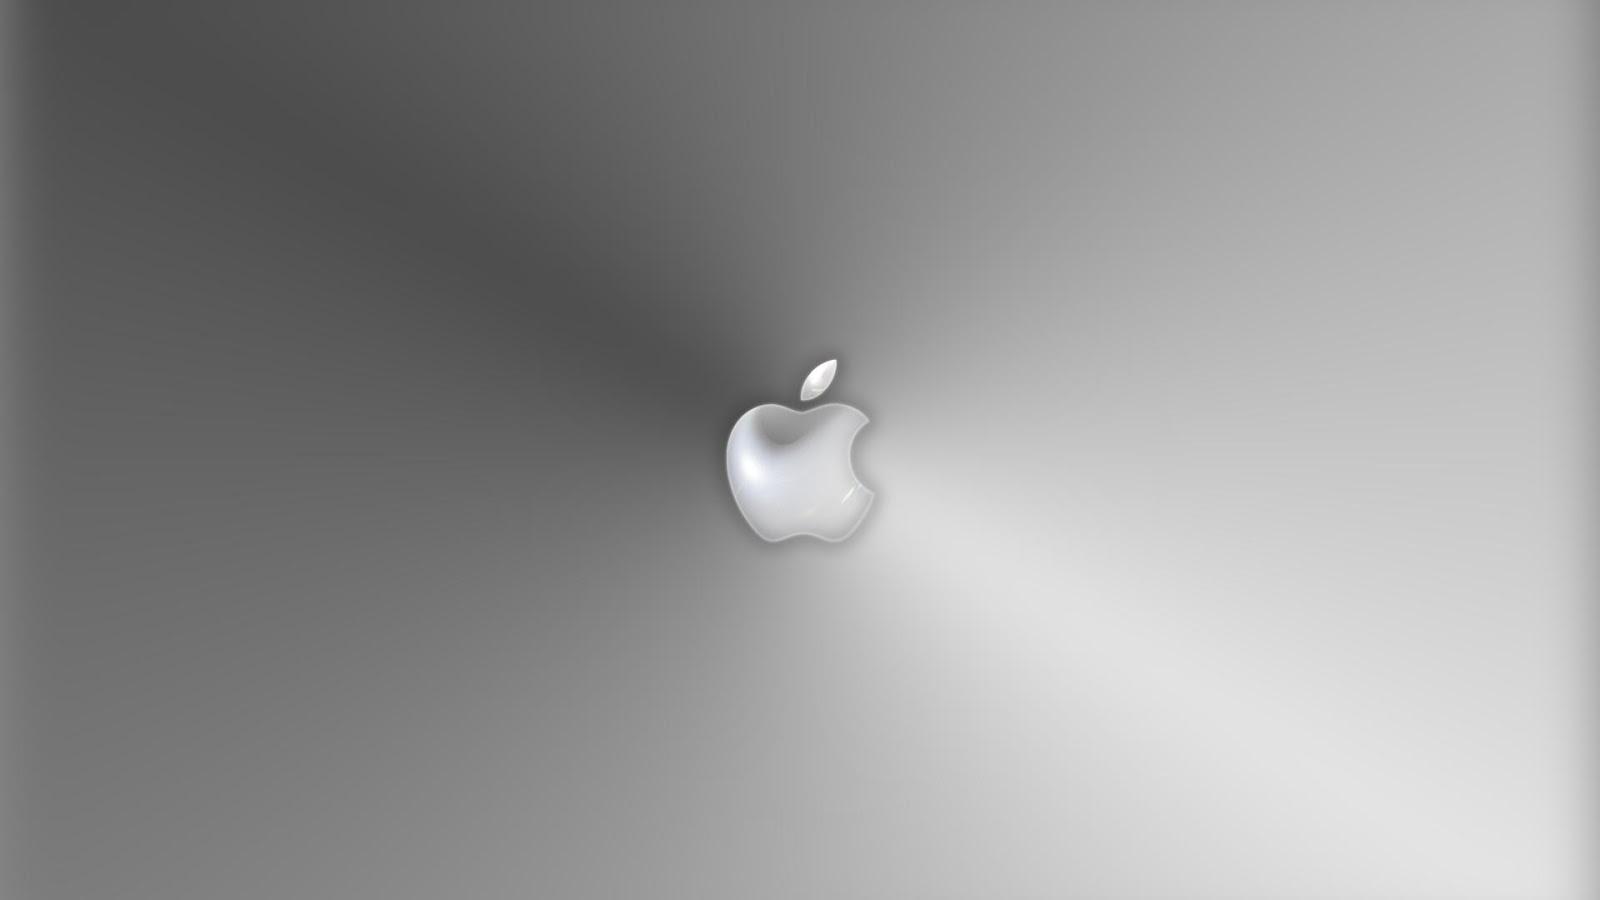 http://4.bp.blogspot.com/-FWa7eCdQJdo/UJ0chBUCyCI/AAAAAAAAGAM/w7Ev_78LsuY/s1600/apple-wallpaper-galerie-computer-1080.jpg